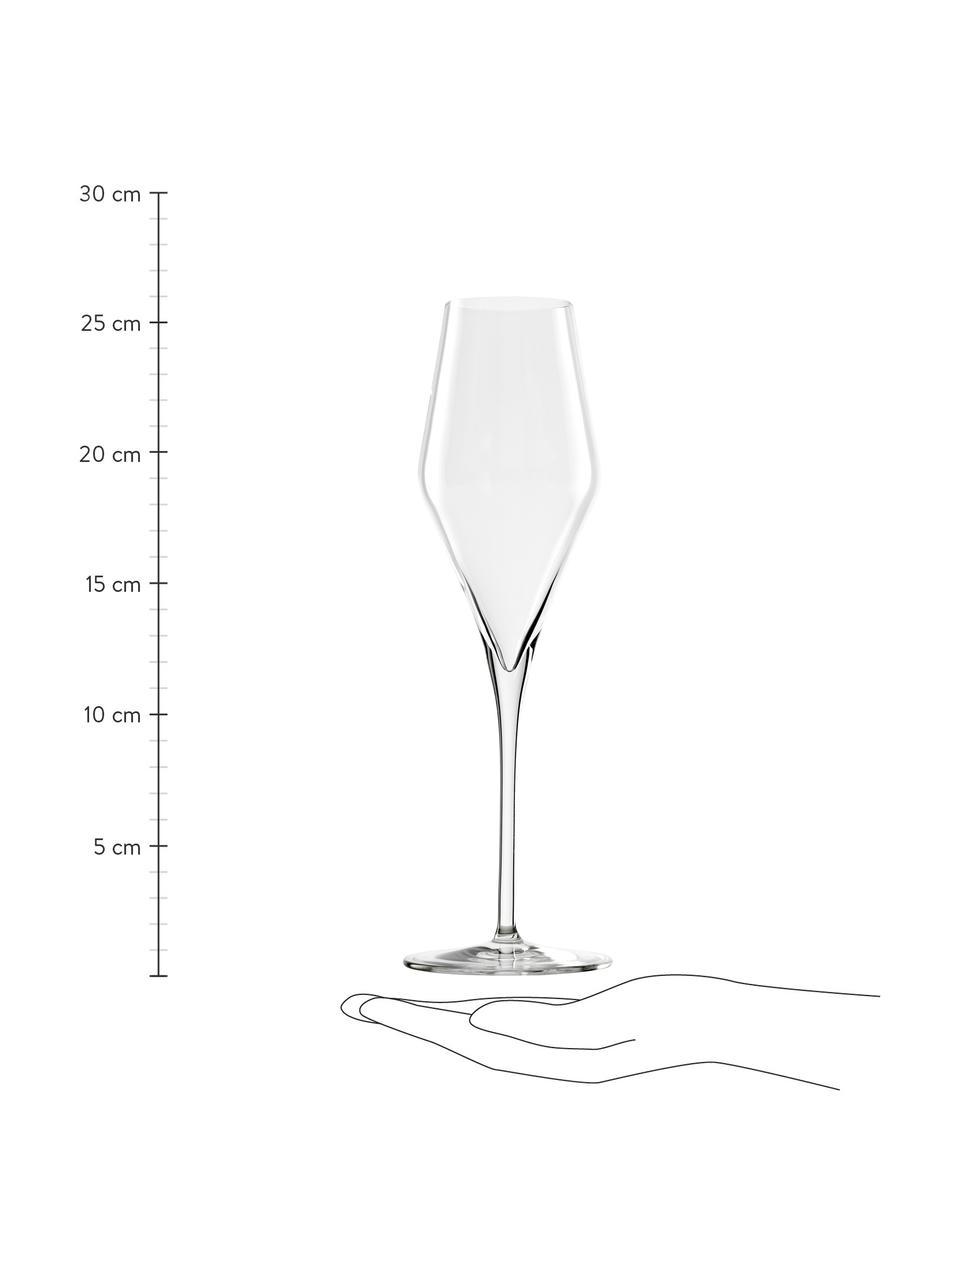 Flute champagne in cristallo Quatrophil 6 pz, Cristallo, Trasparente, Ø 8 x Alt. 26 cm